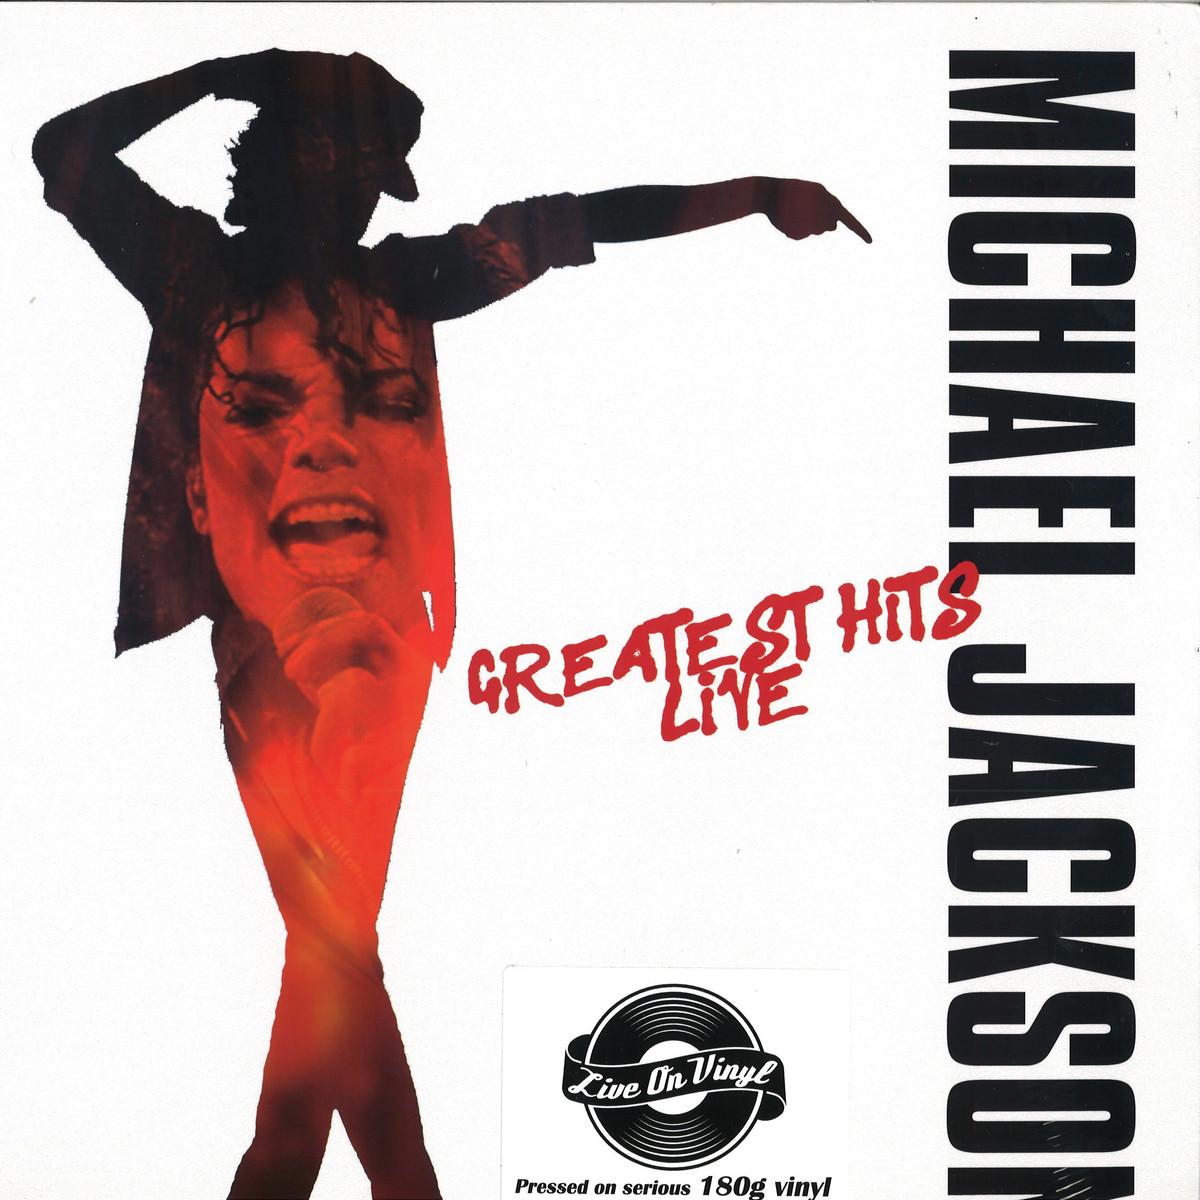 Michael Jackson - Greatest Hits - Live / Live On Vinyl LOVLP2034 - Vinyl